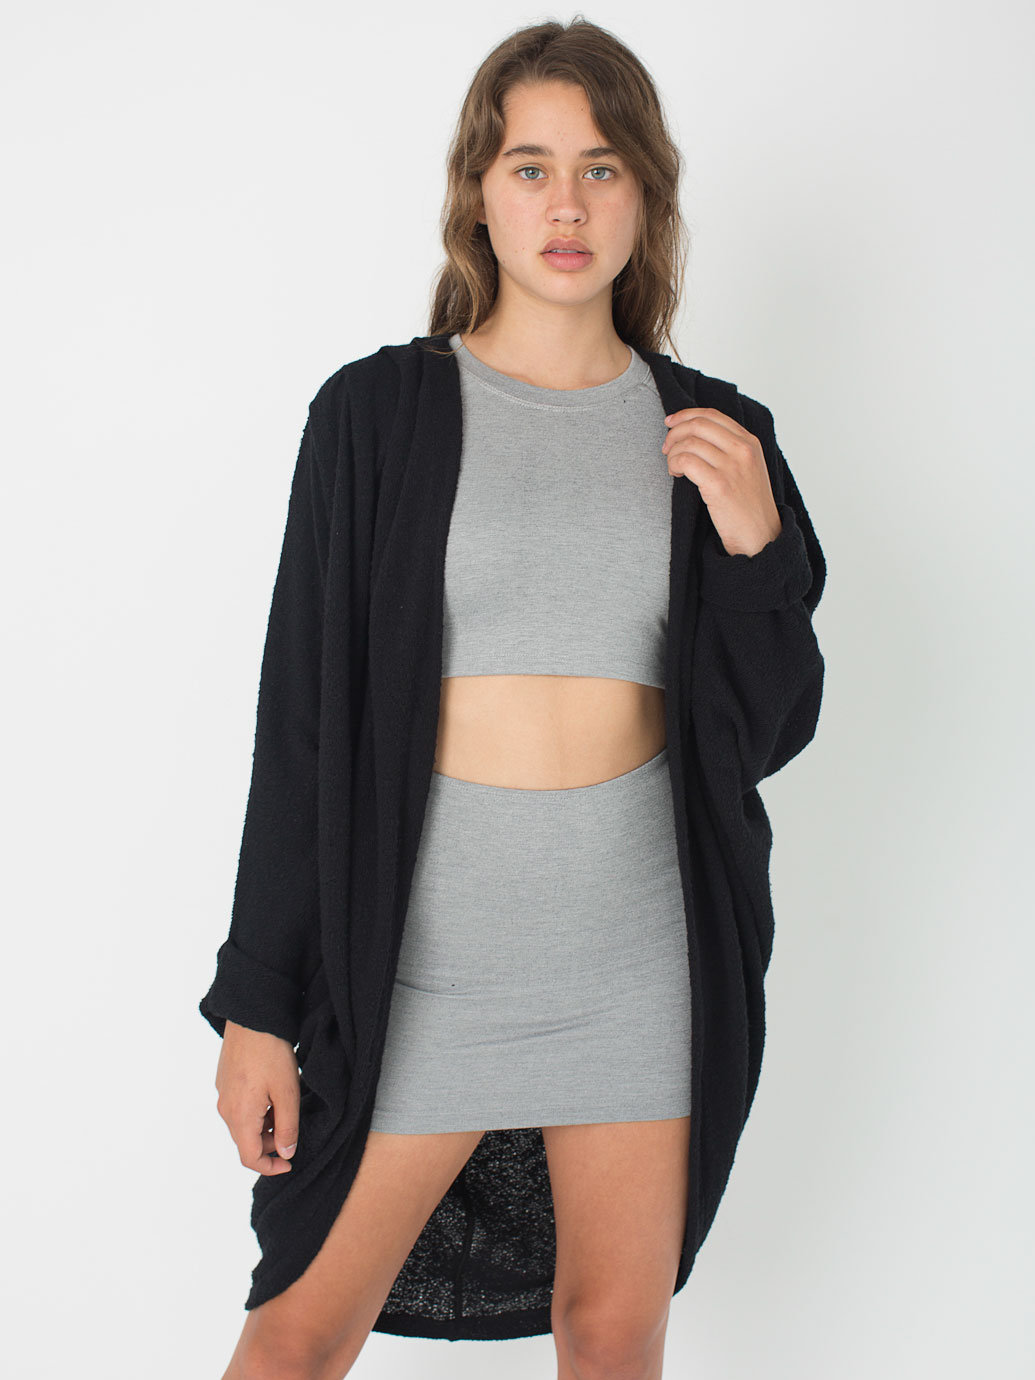 Bouclé shawl cardigan